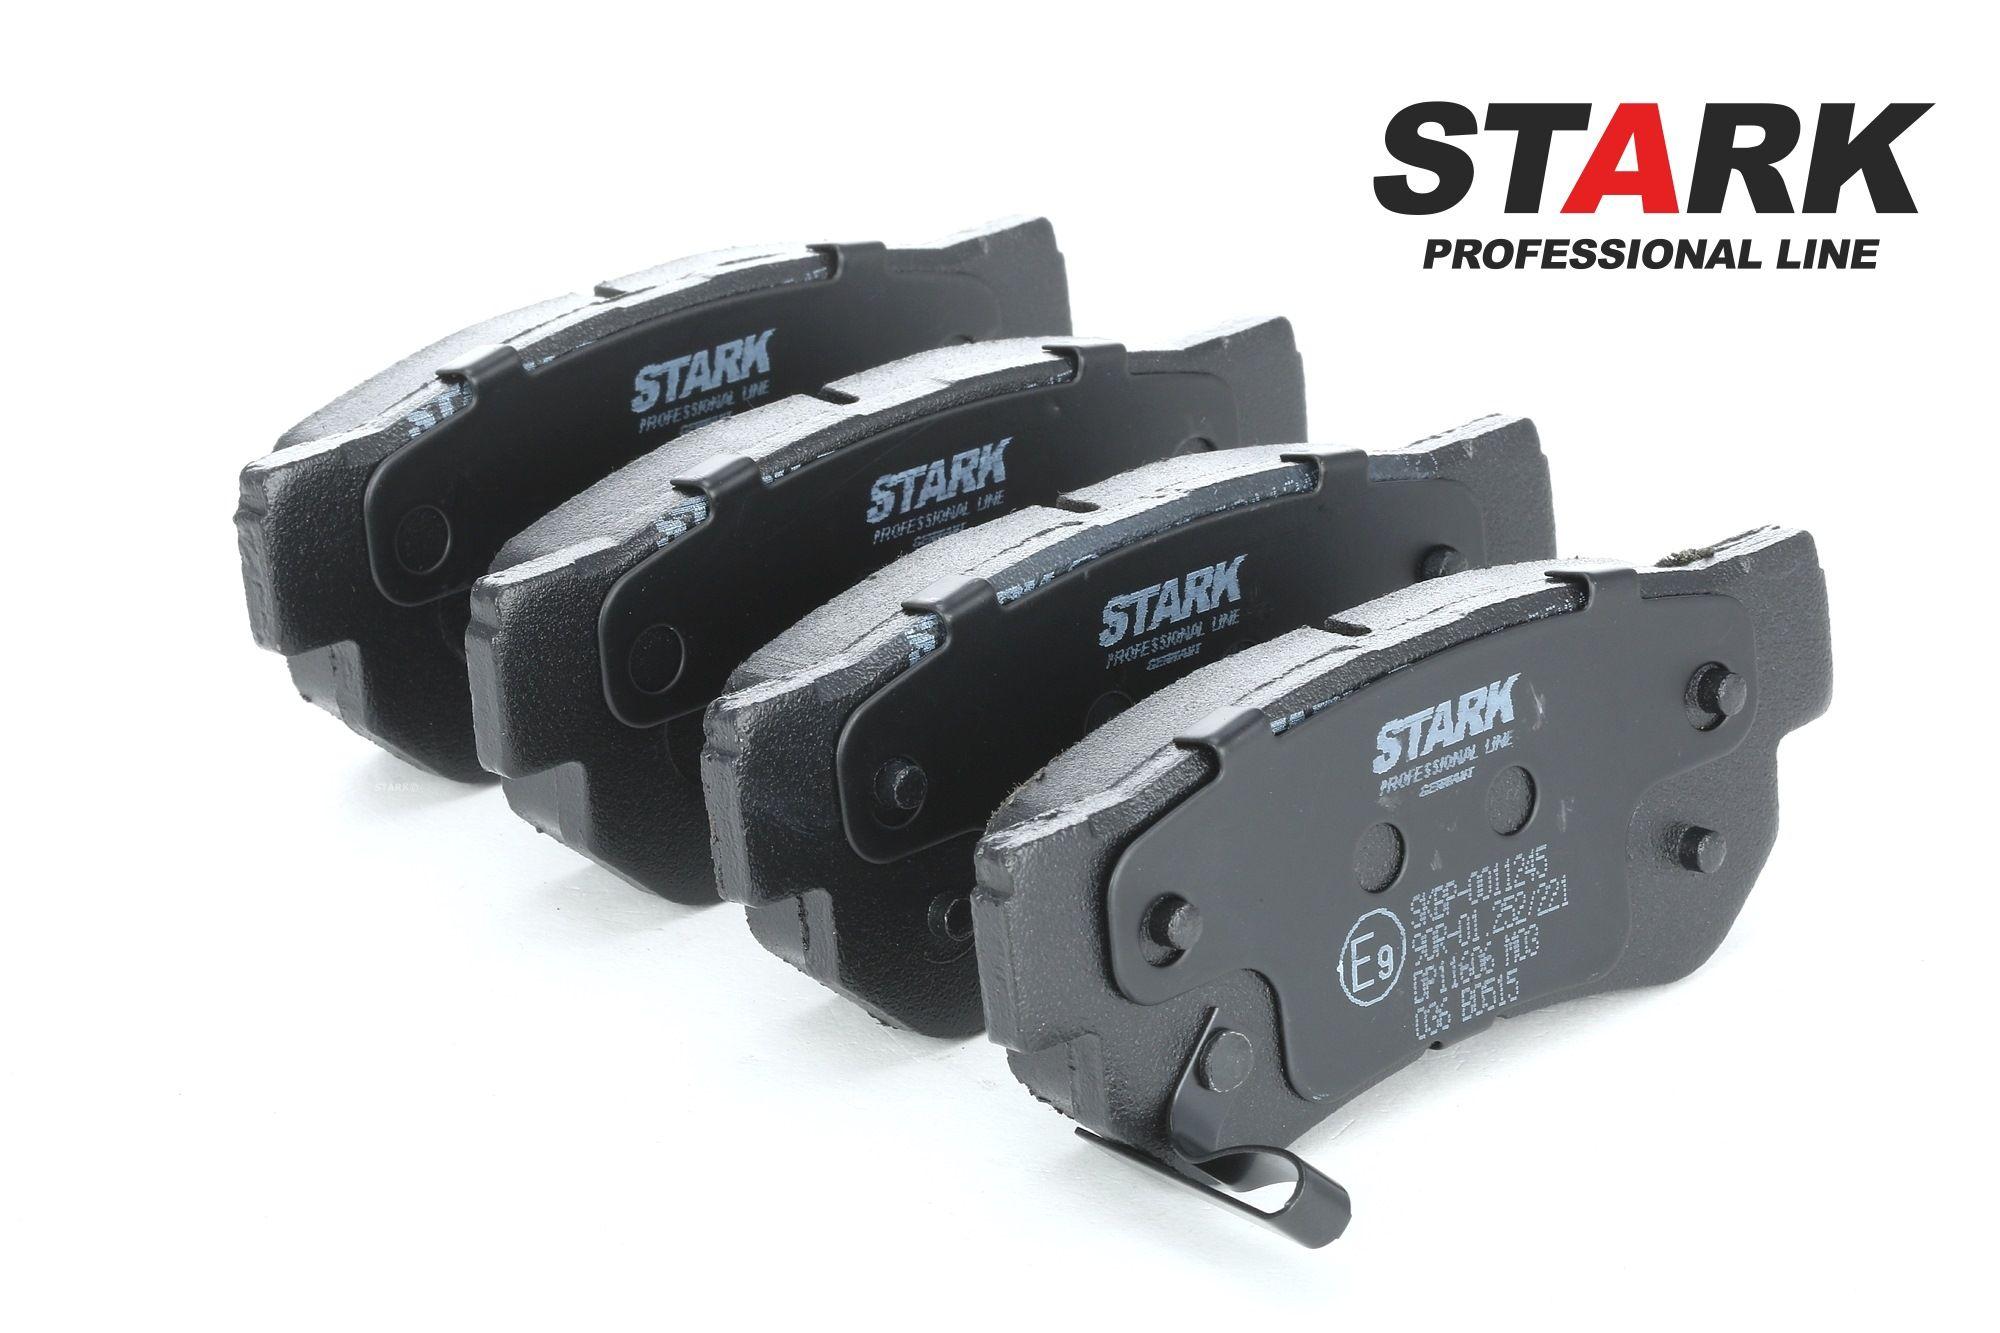 SSANGYONG RODIUS 2020 Bremsbelagsatz - Original STARK SKBP-0011245 Höhe: 41mm, Breite: 98,8mm, Dicke/Stärke: 15mm